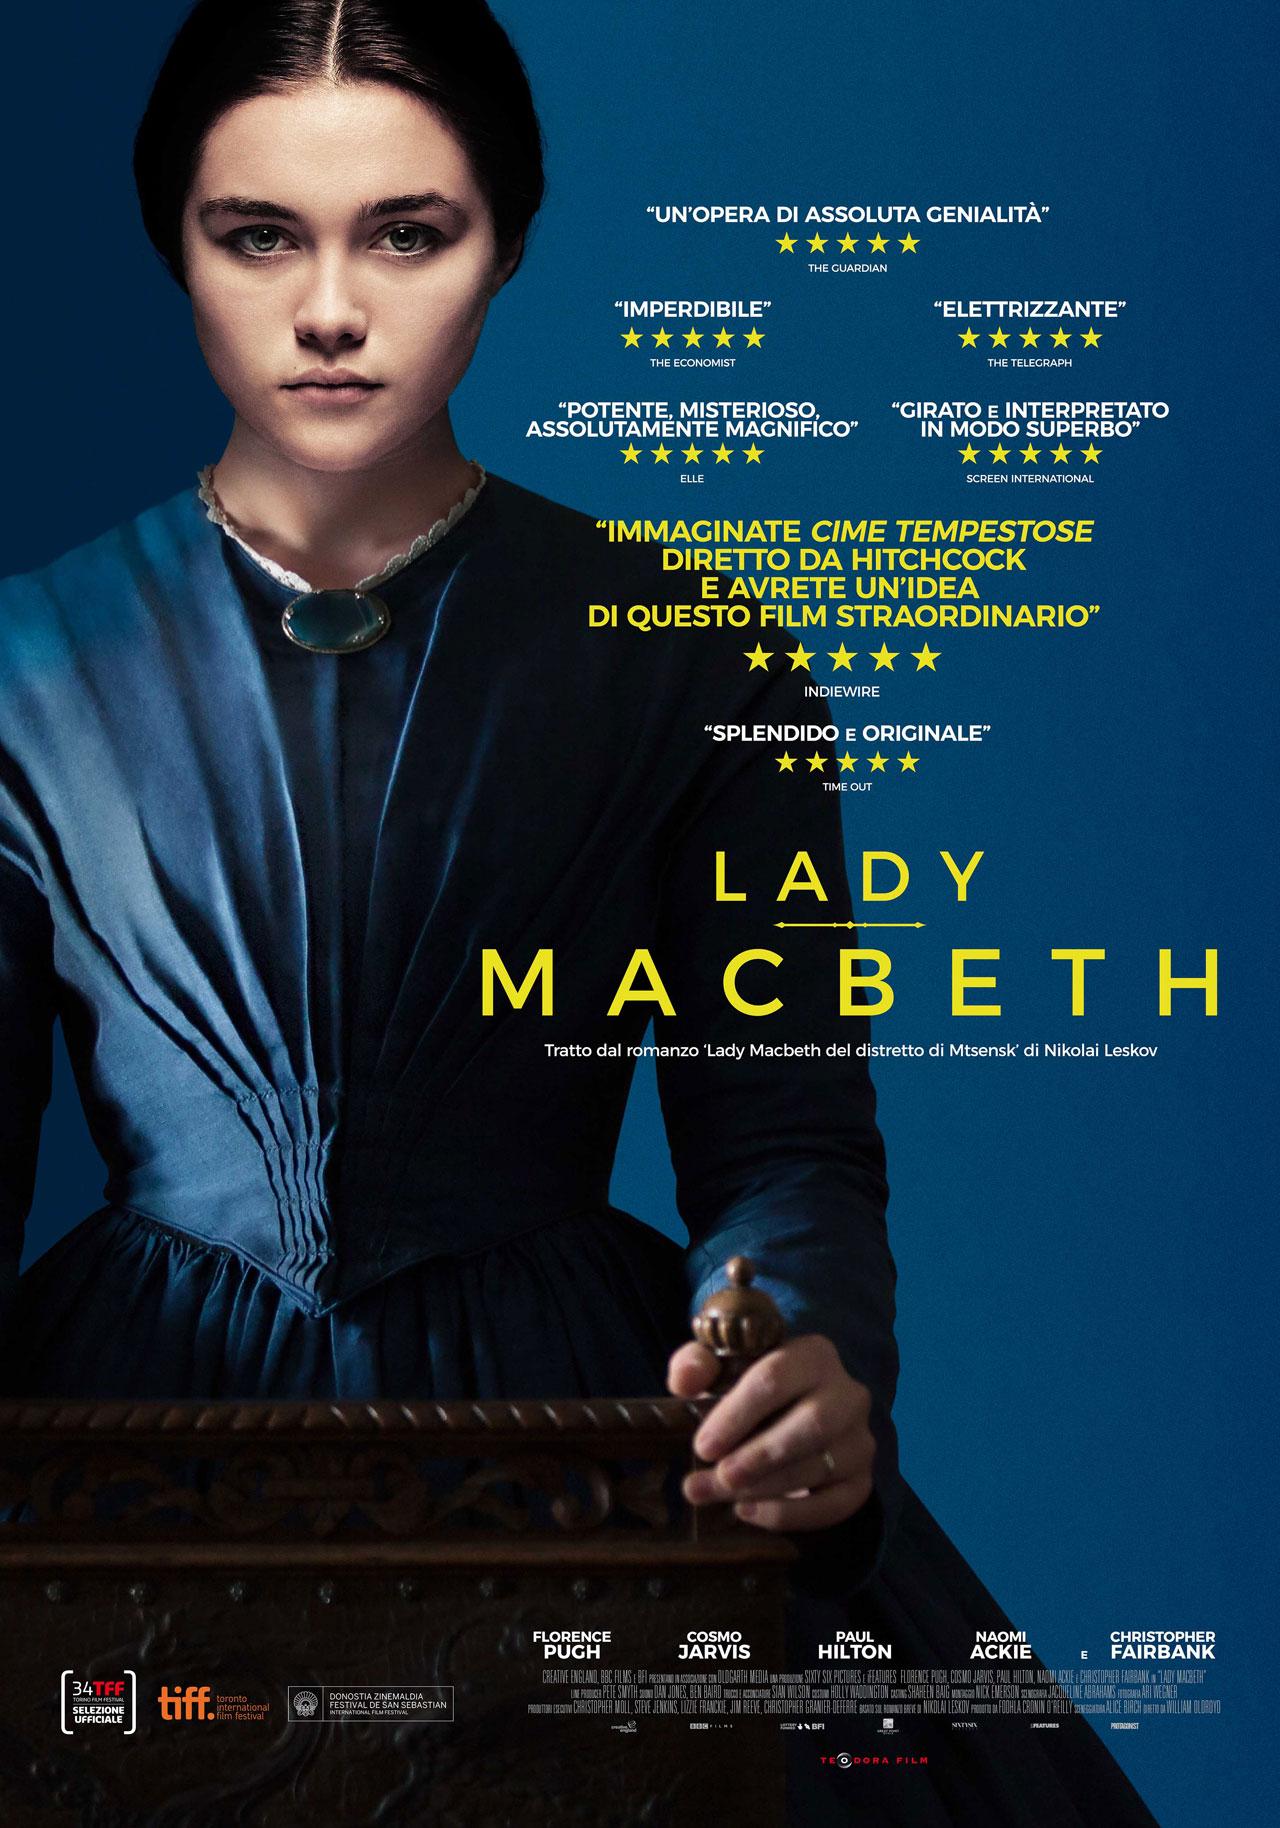 Macbeth 2021 Film